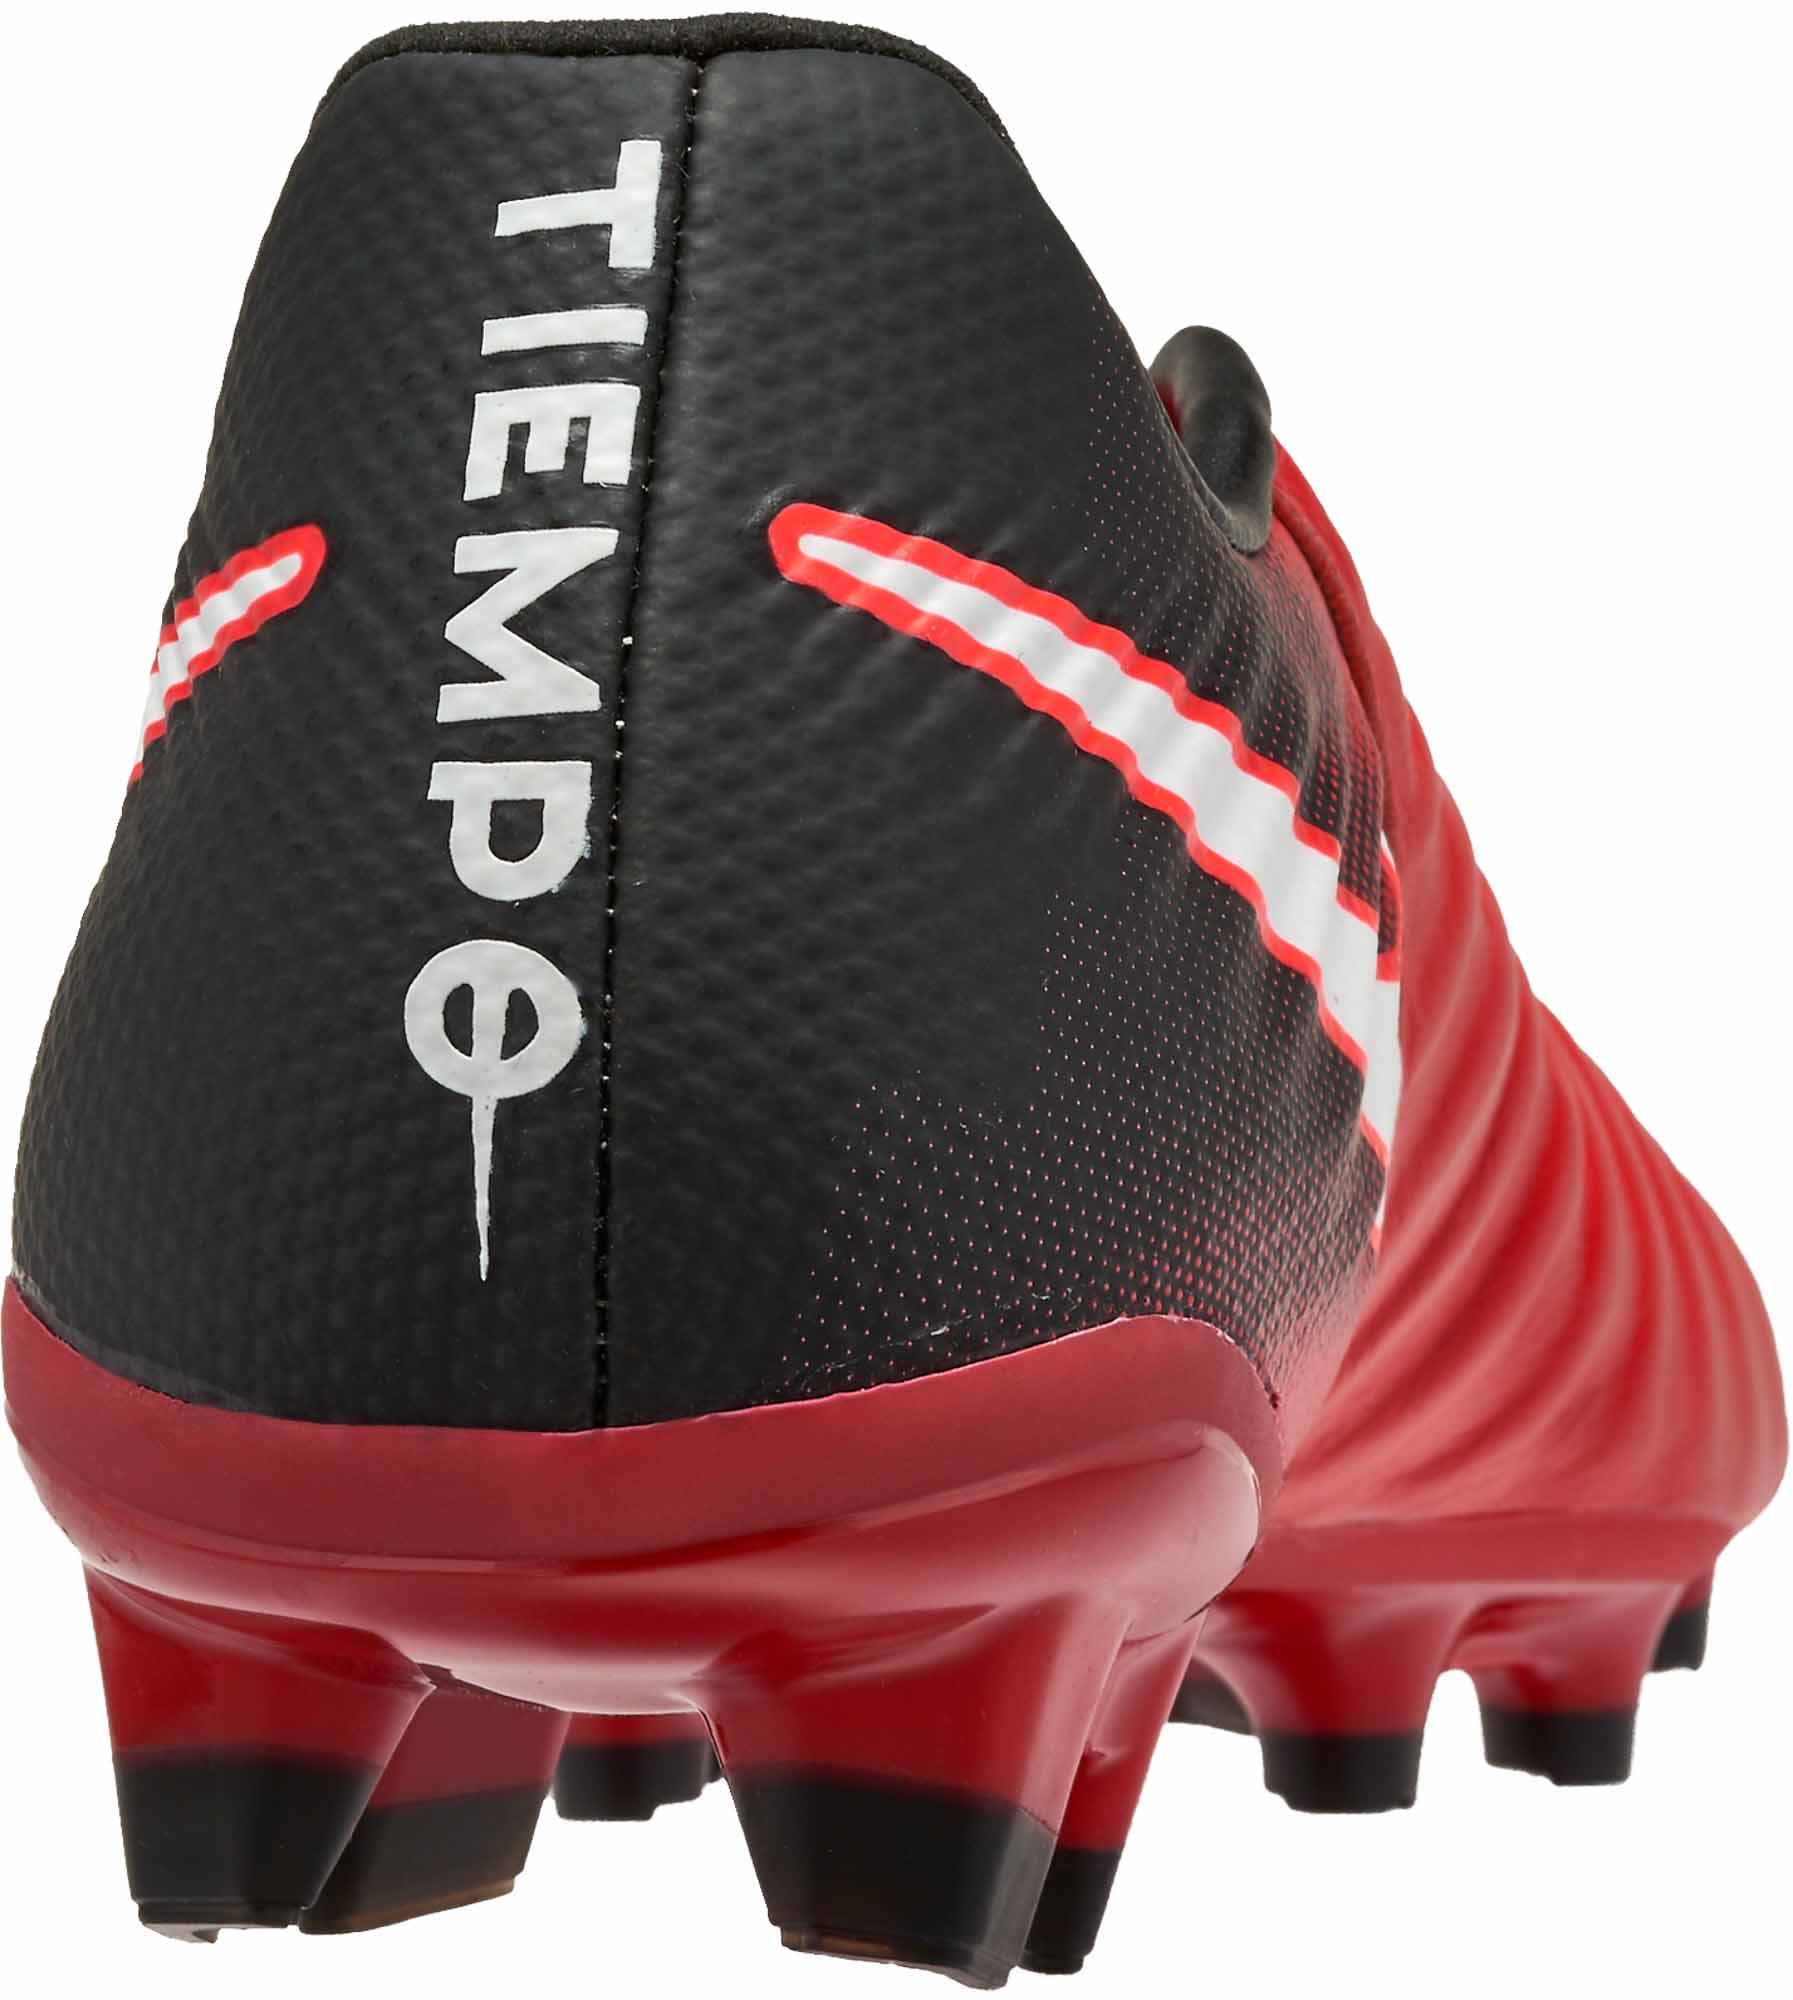 Nike Kids Tiempo Legend VII FG - University Red   White - Soccer Master cdd411c1eb2b8